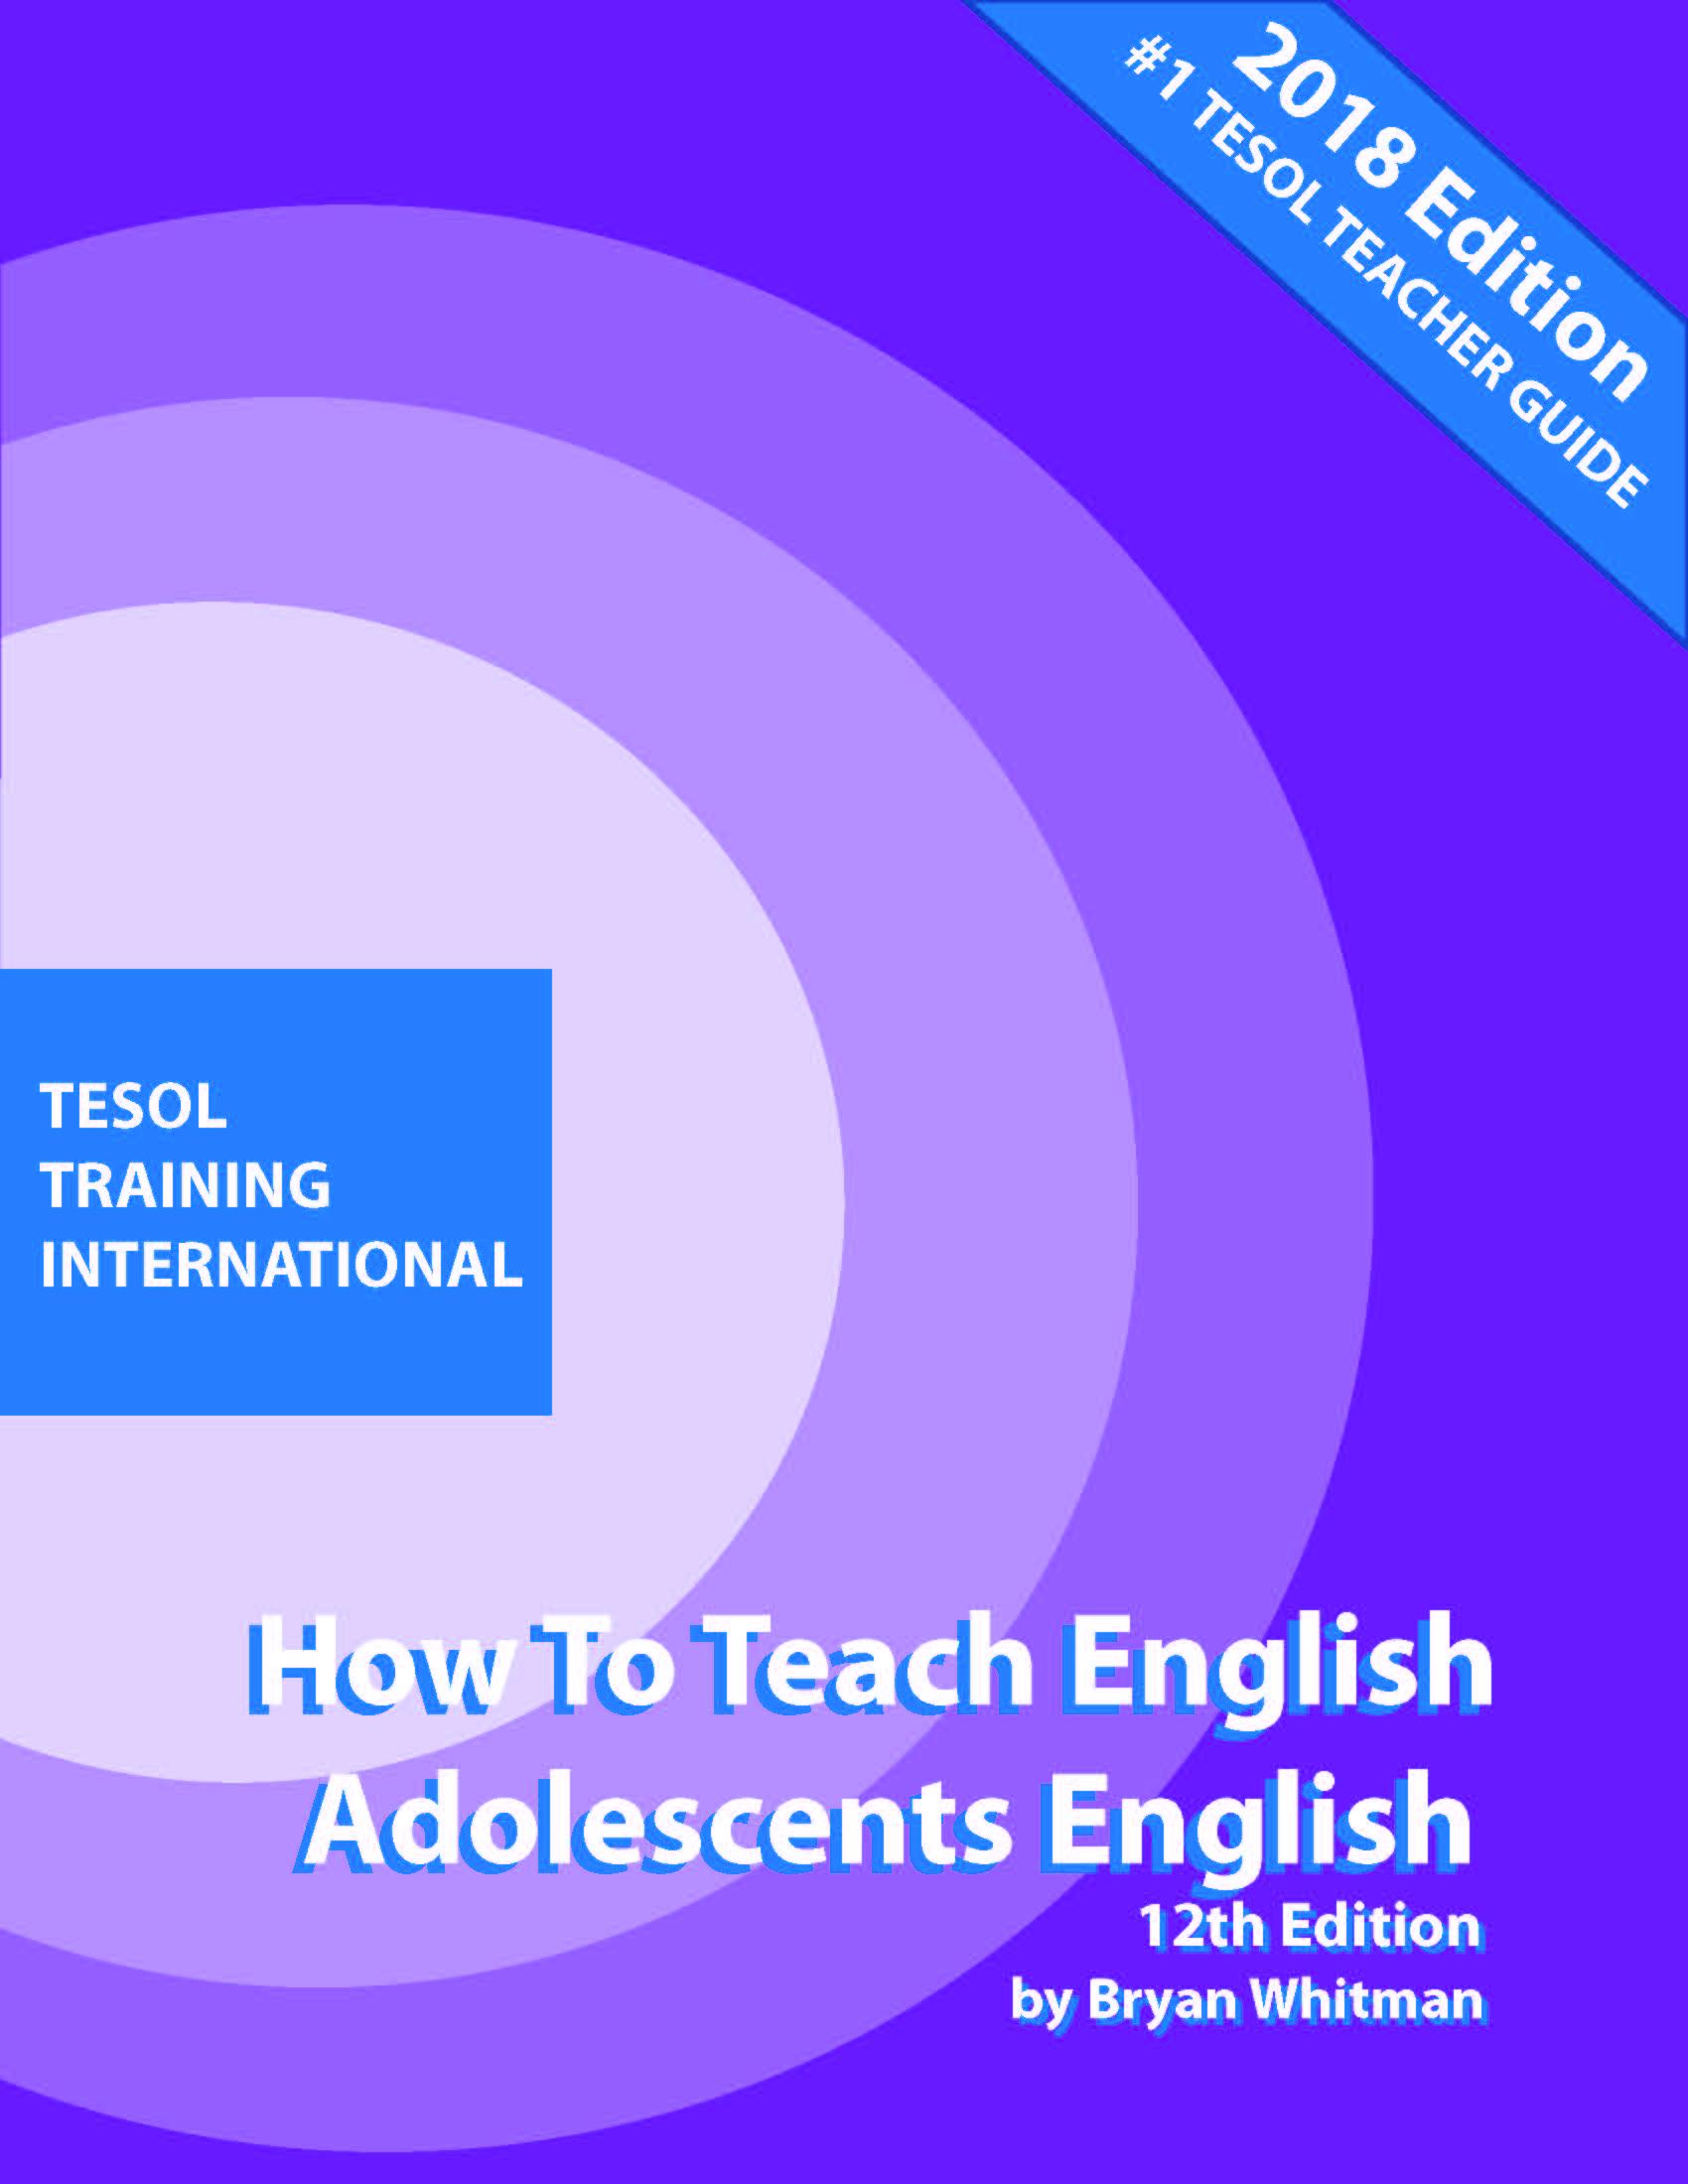 Teach English to Adolescents Course